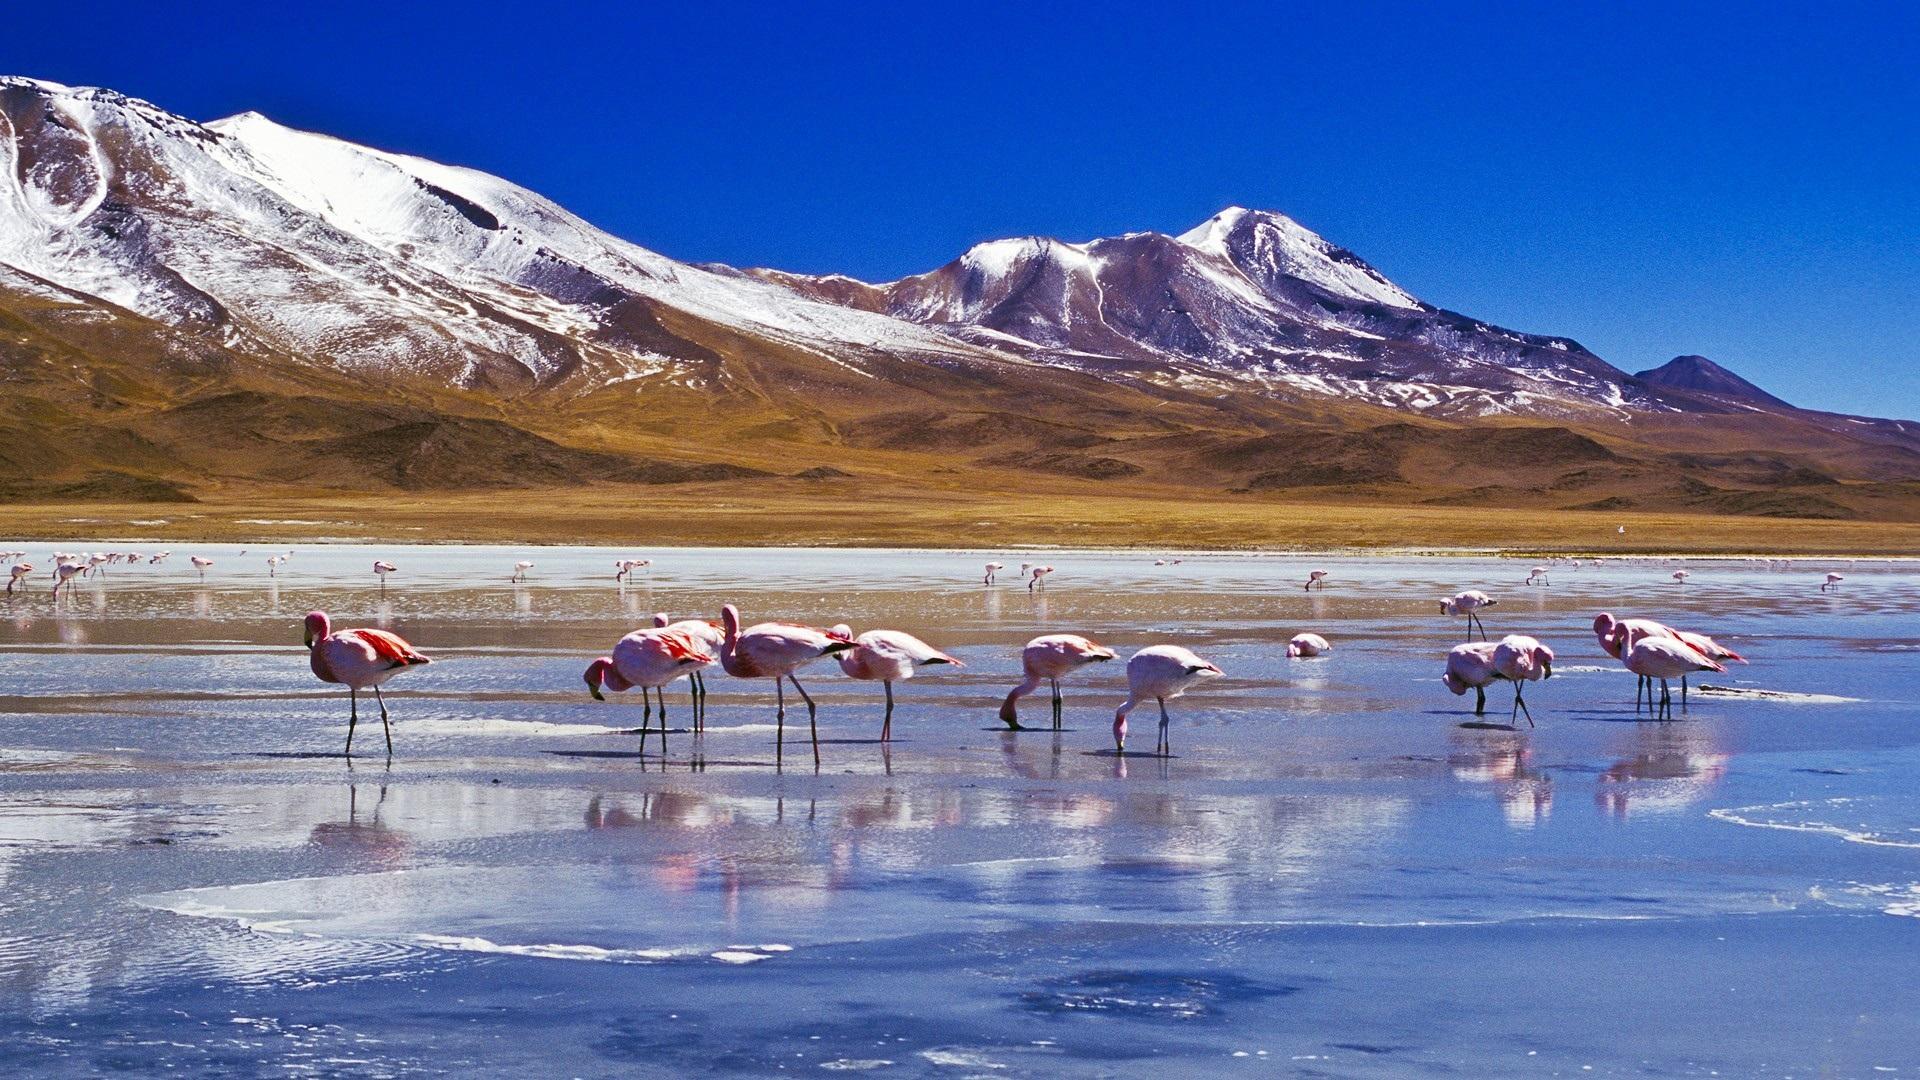 ... , lago, pájaros, flamencos Fondos de pantalla - 1920x1080 Full HD Hd Wallpaper 1920x1080